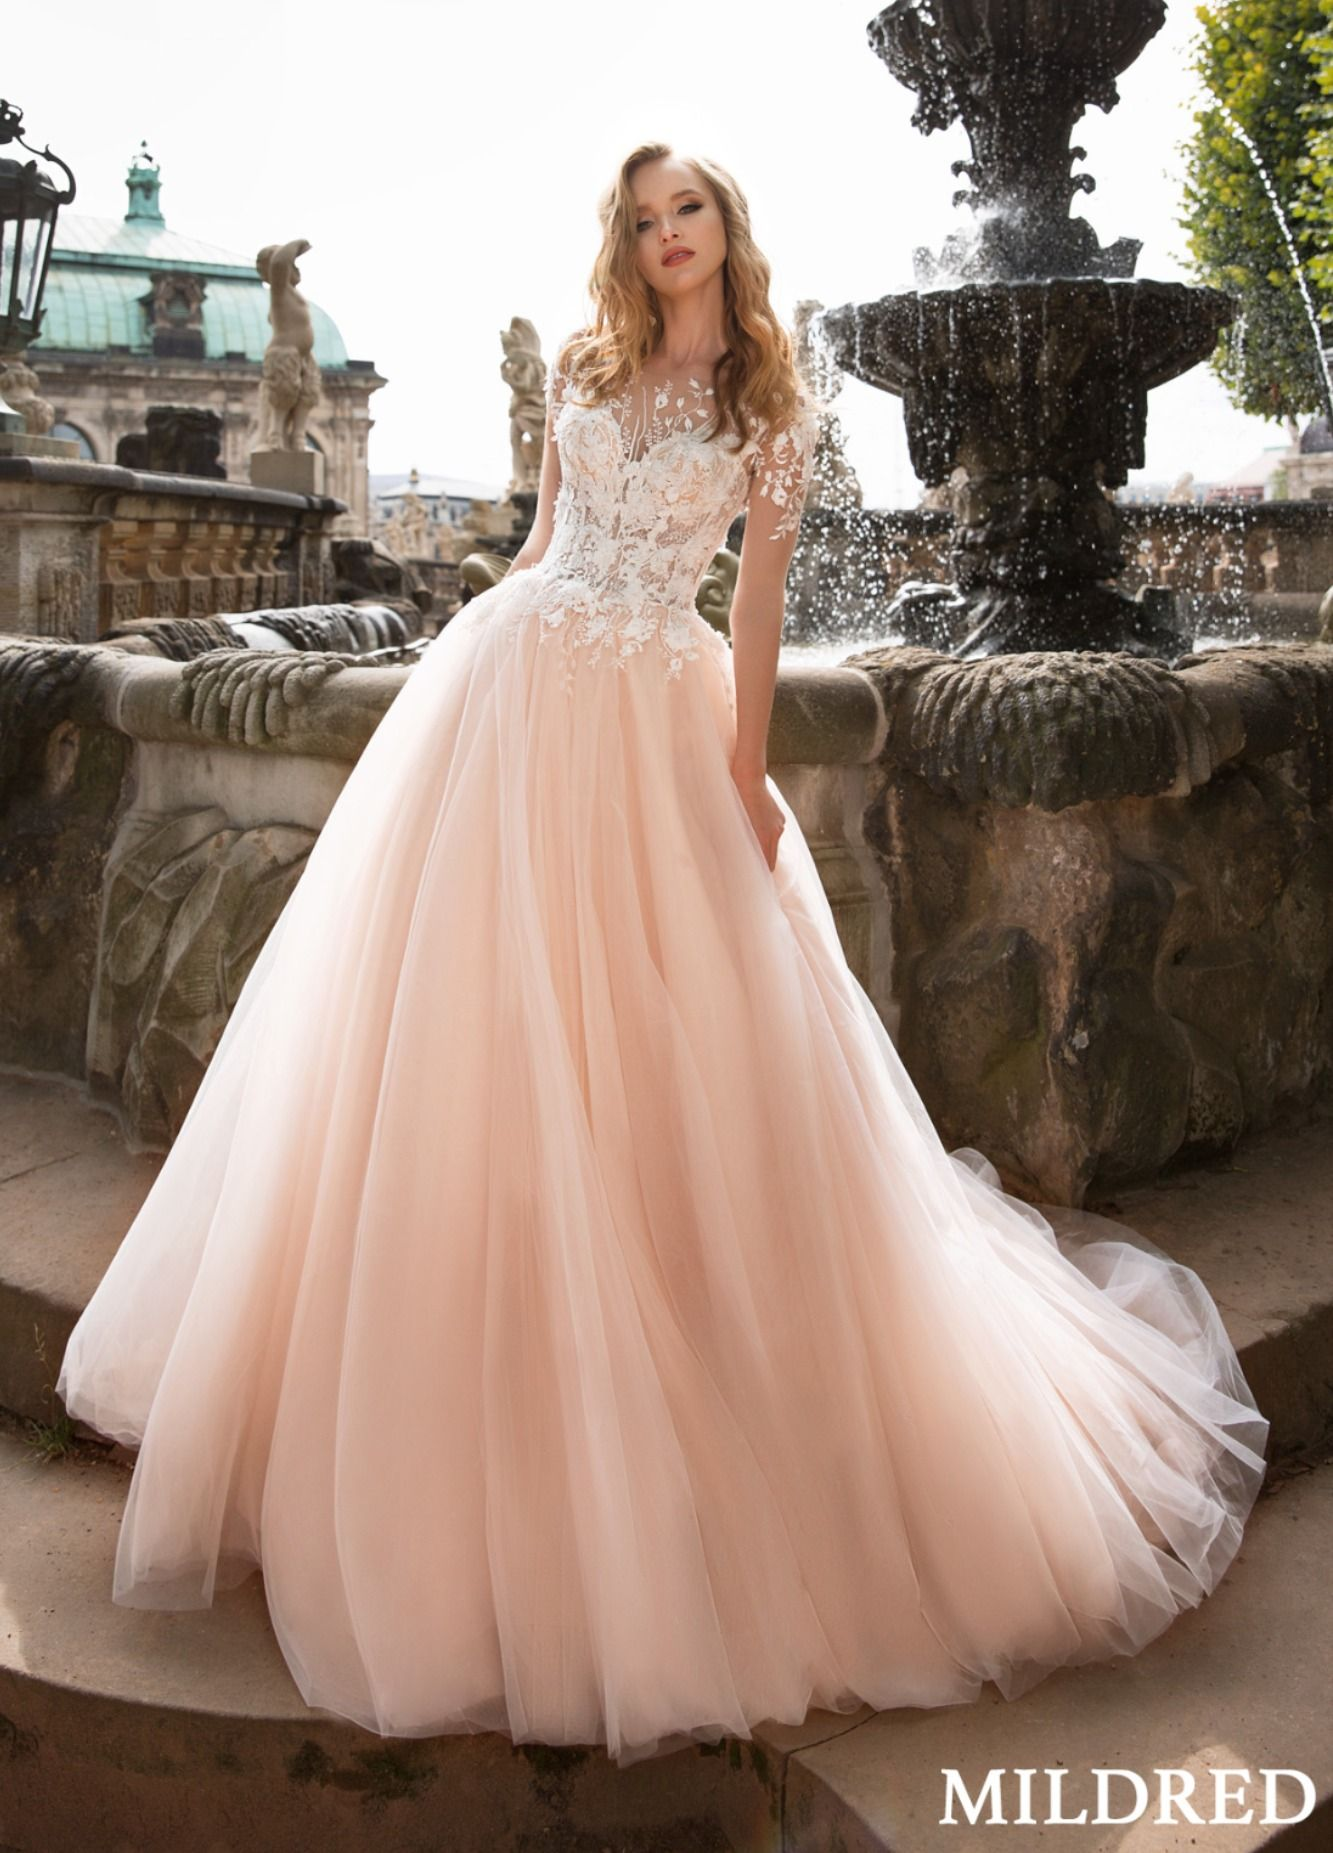 Mildred Wedding Dress Royal Promenade Collection Blush Pink Wedding Dress Light Pink Wedding Dress Modest Bridal Dresses [ 1853 x 1333 Pixel ]